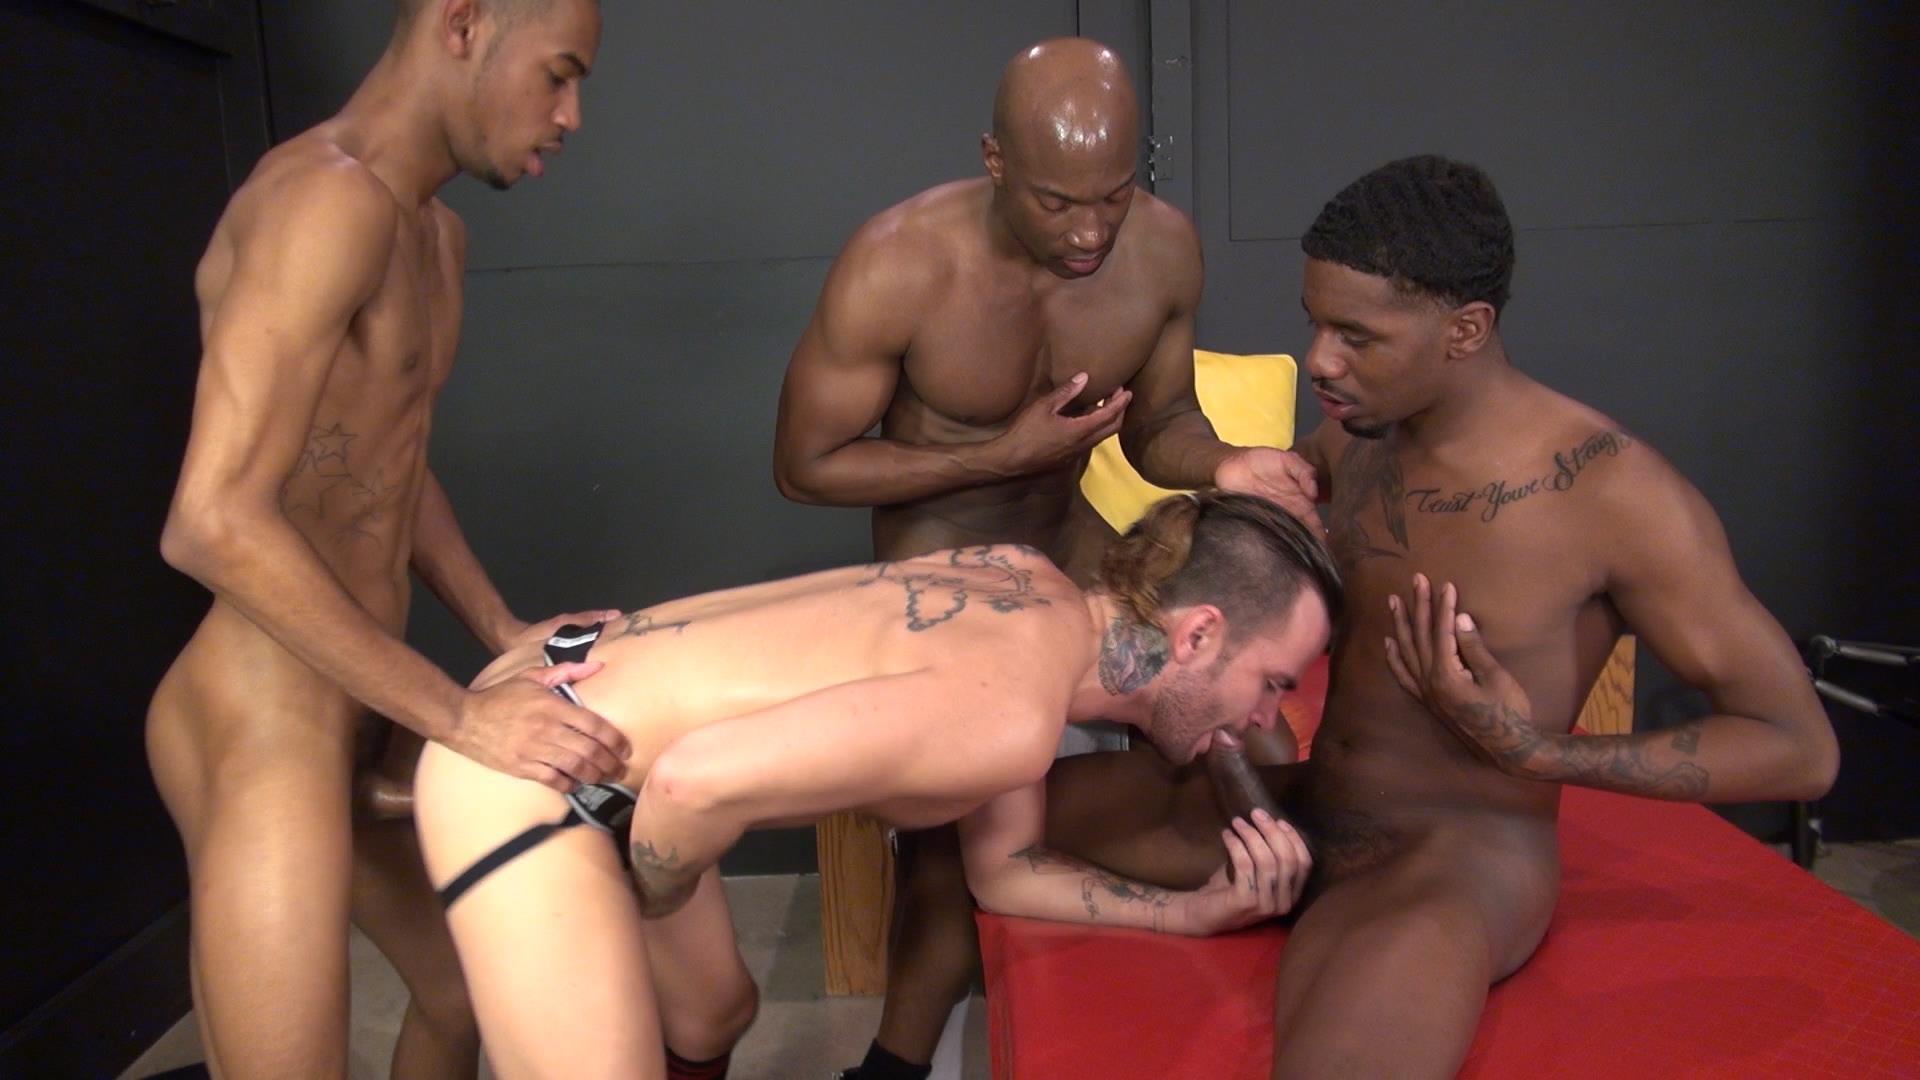 Raw-and-Rough-Champ-Robinson-Lukas-Cipriani-Knockout-Tigger-Redd-BBBH-Amateur-Gay-Porn-06 White Boy Gets A Breeding By Three Big Black Dicks